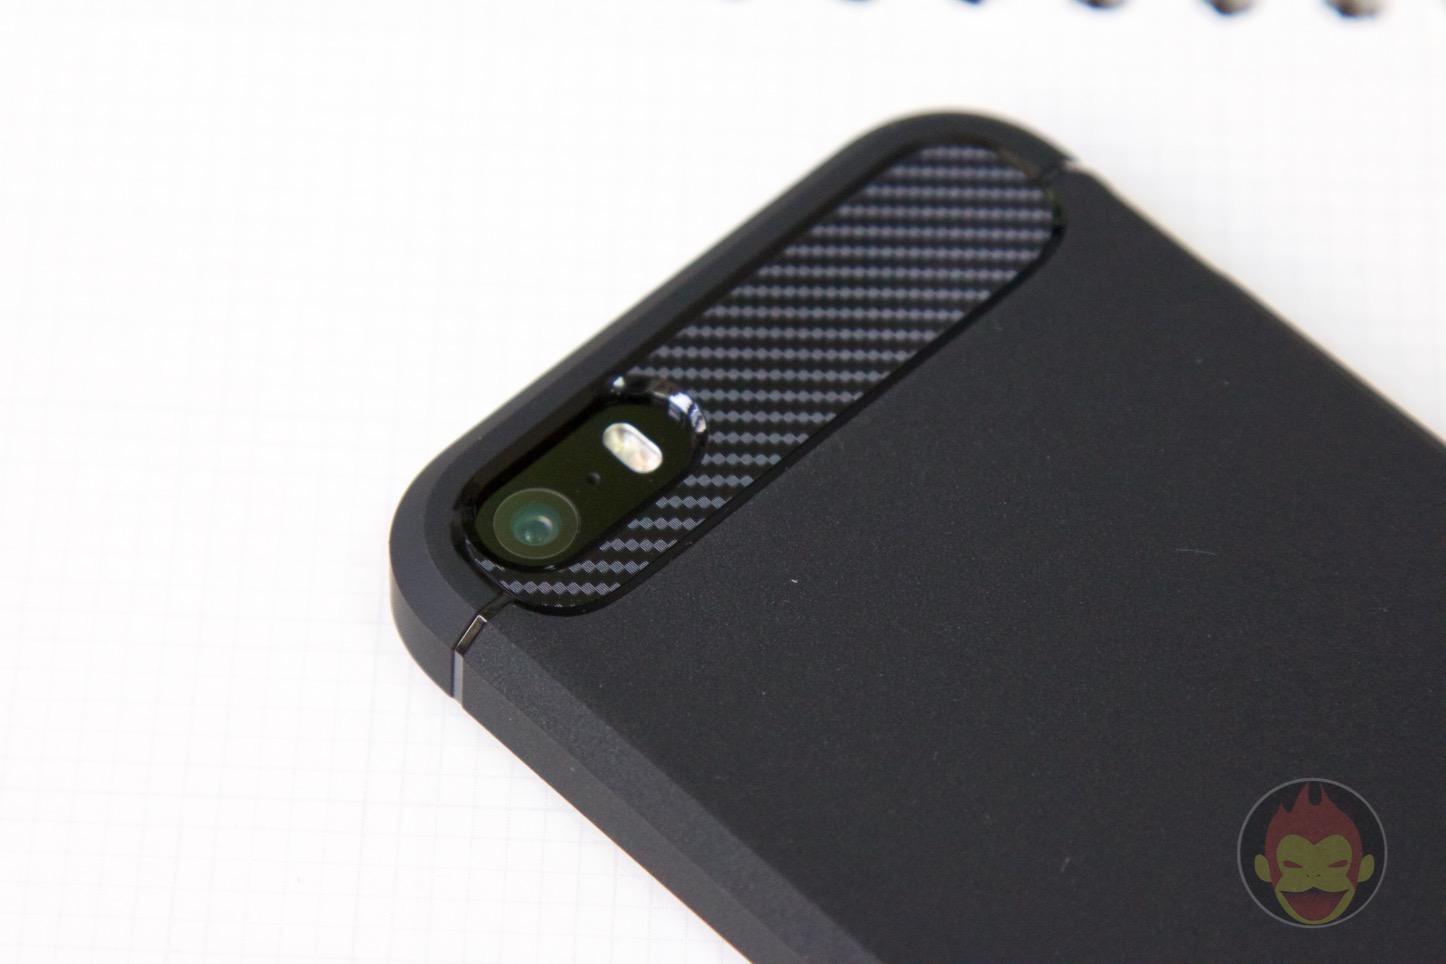 Spigen-Rugged-Case-iPhone-08.jpg